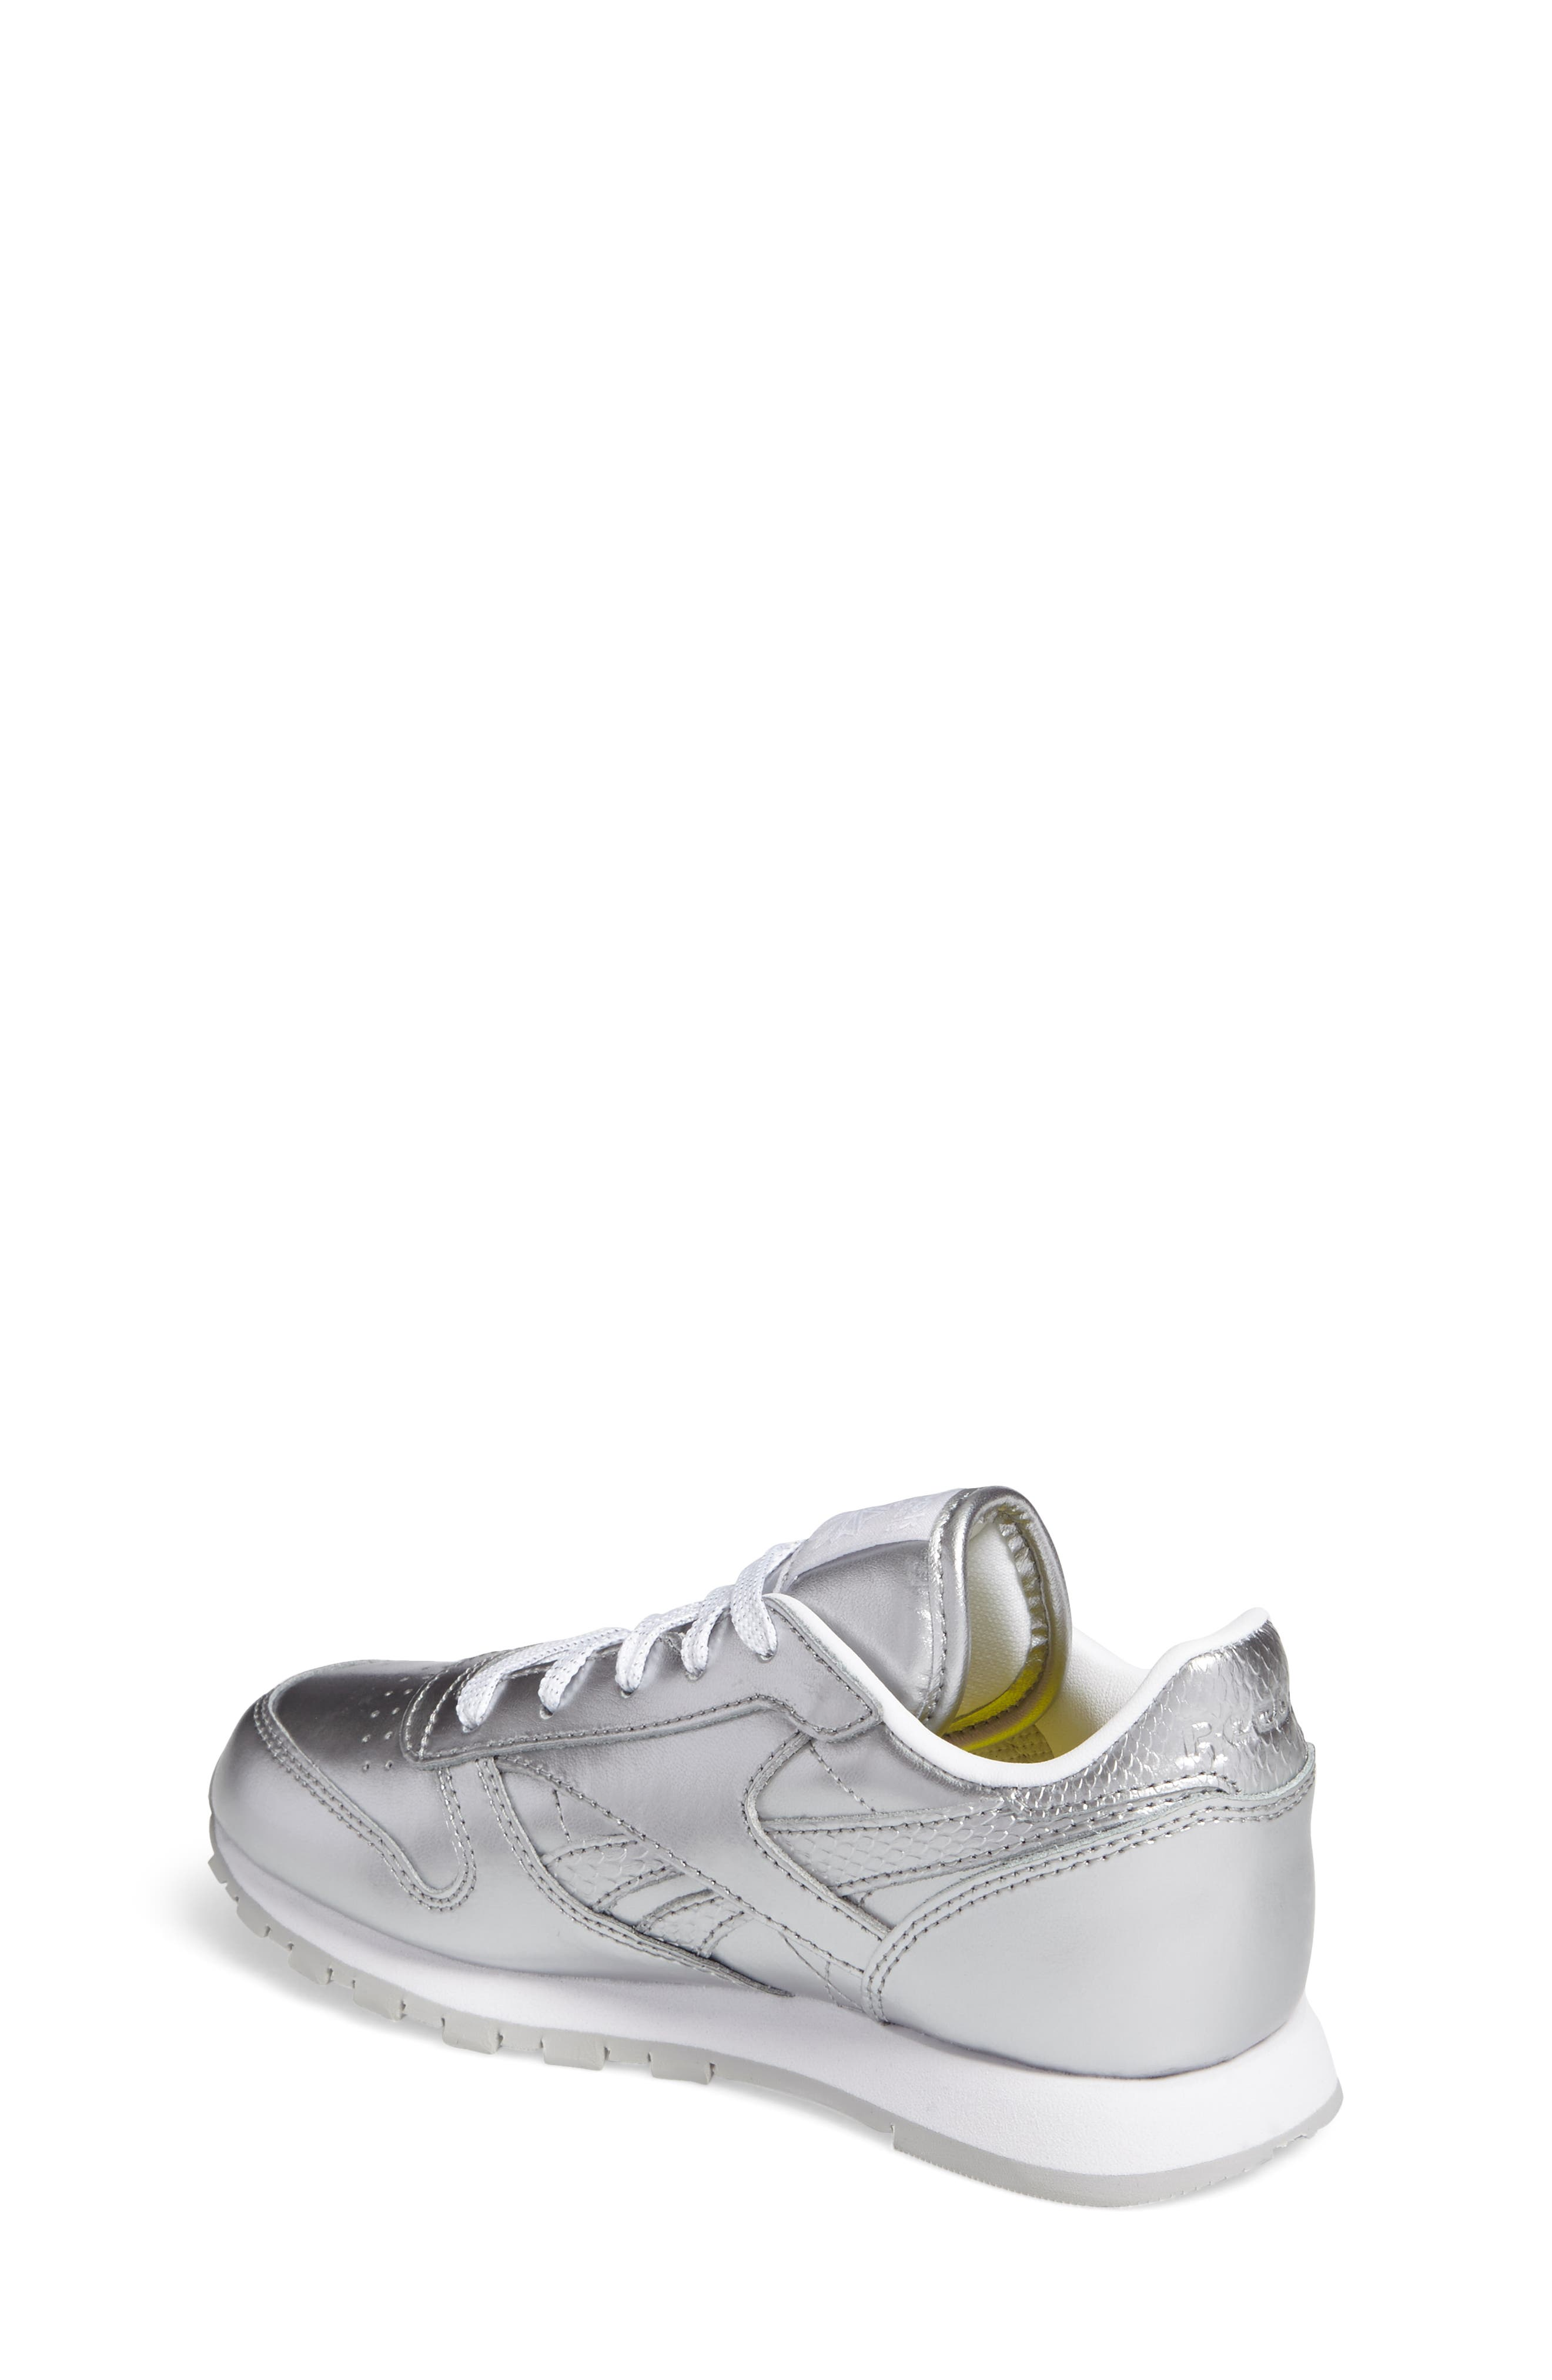 Alternate Image 2  - Reebok Classic Metallic Sneaker (Baby, Walker, Toddler, Little Kid & Big Kid)